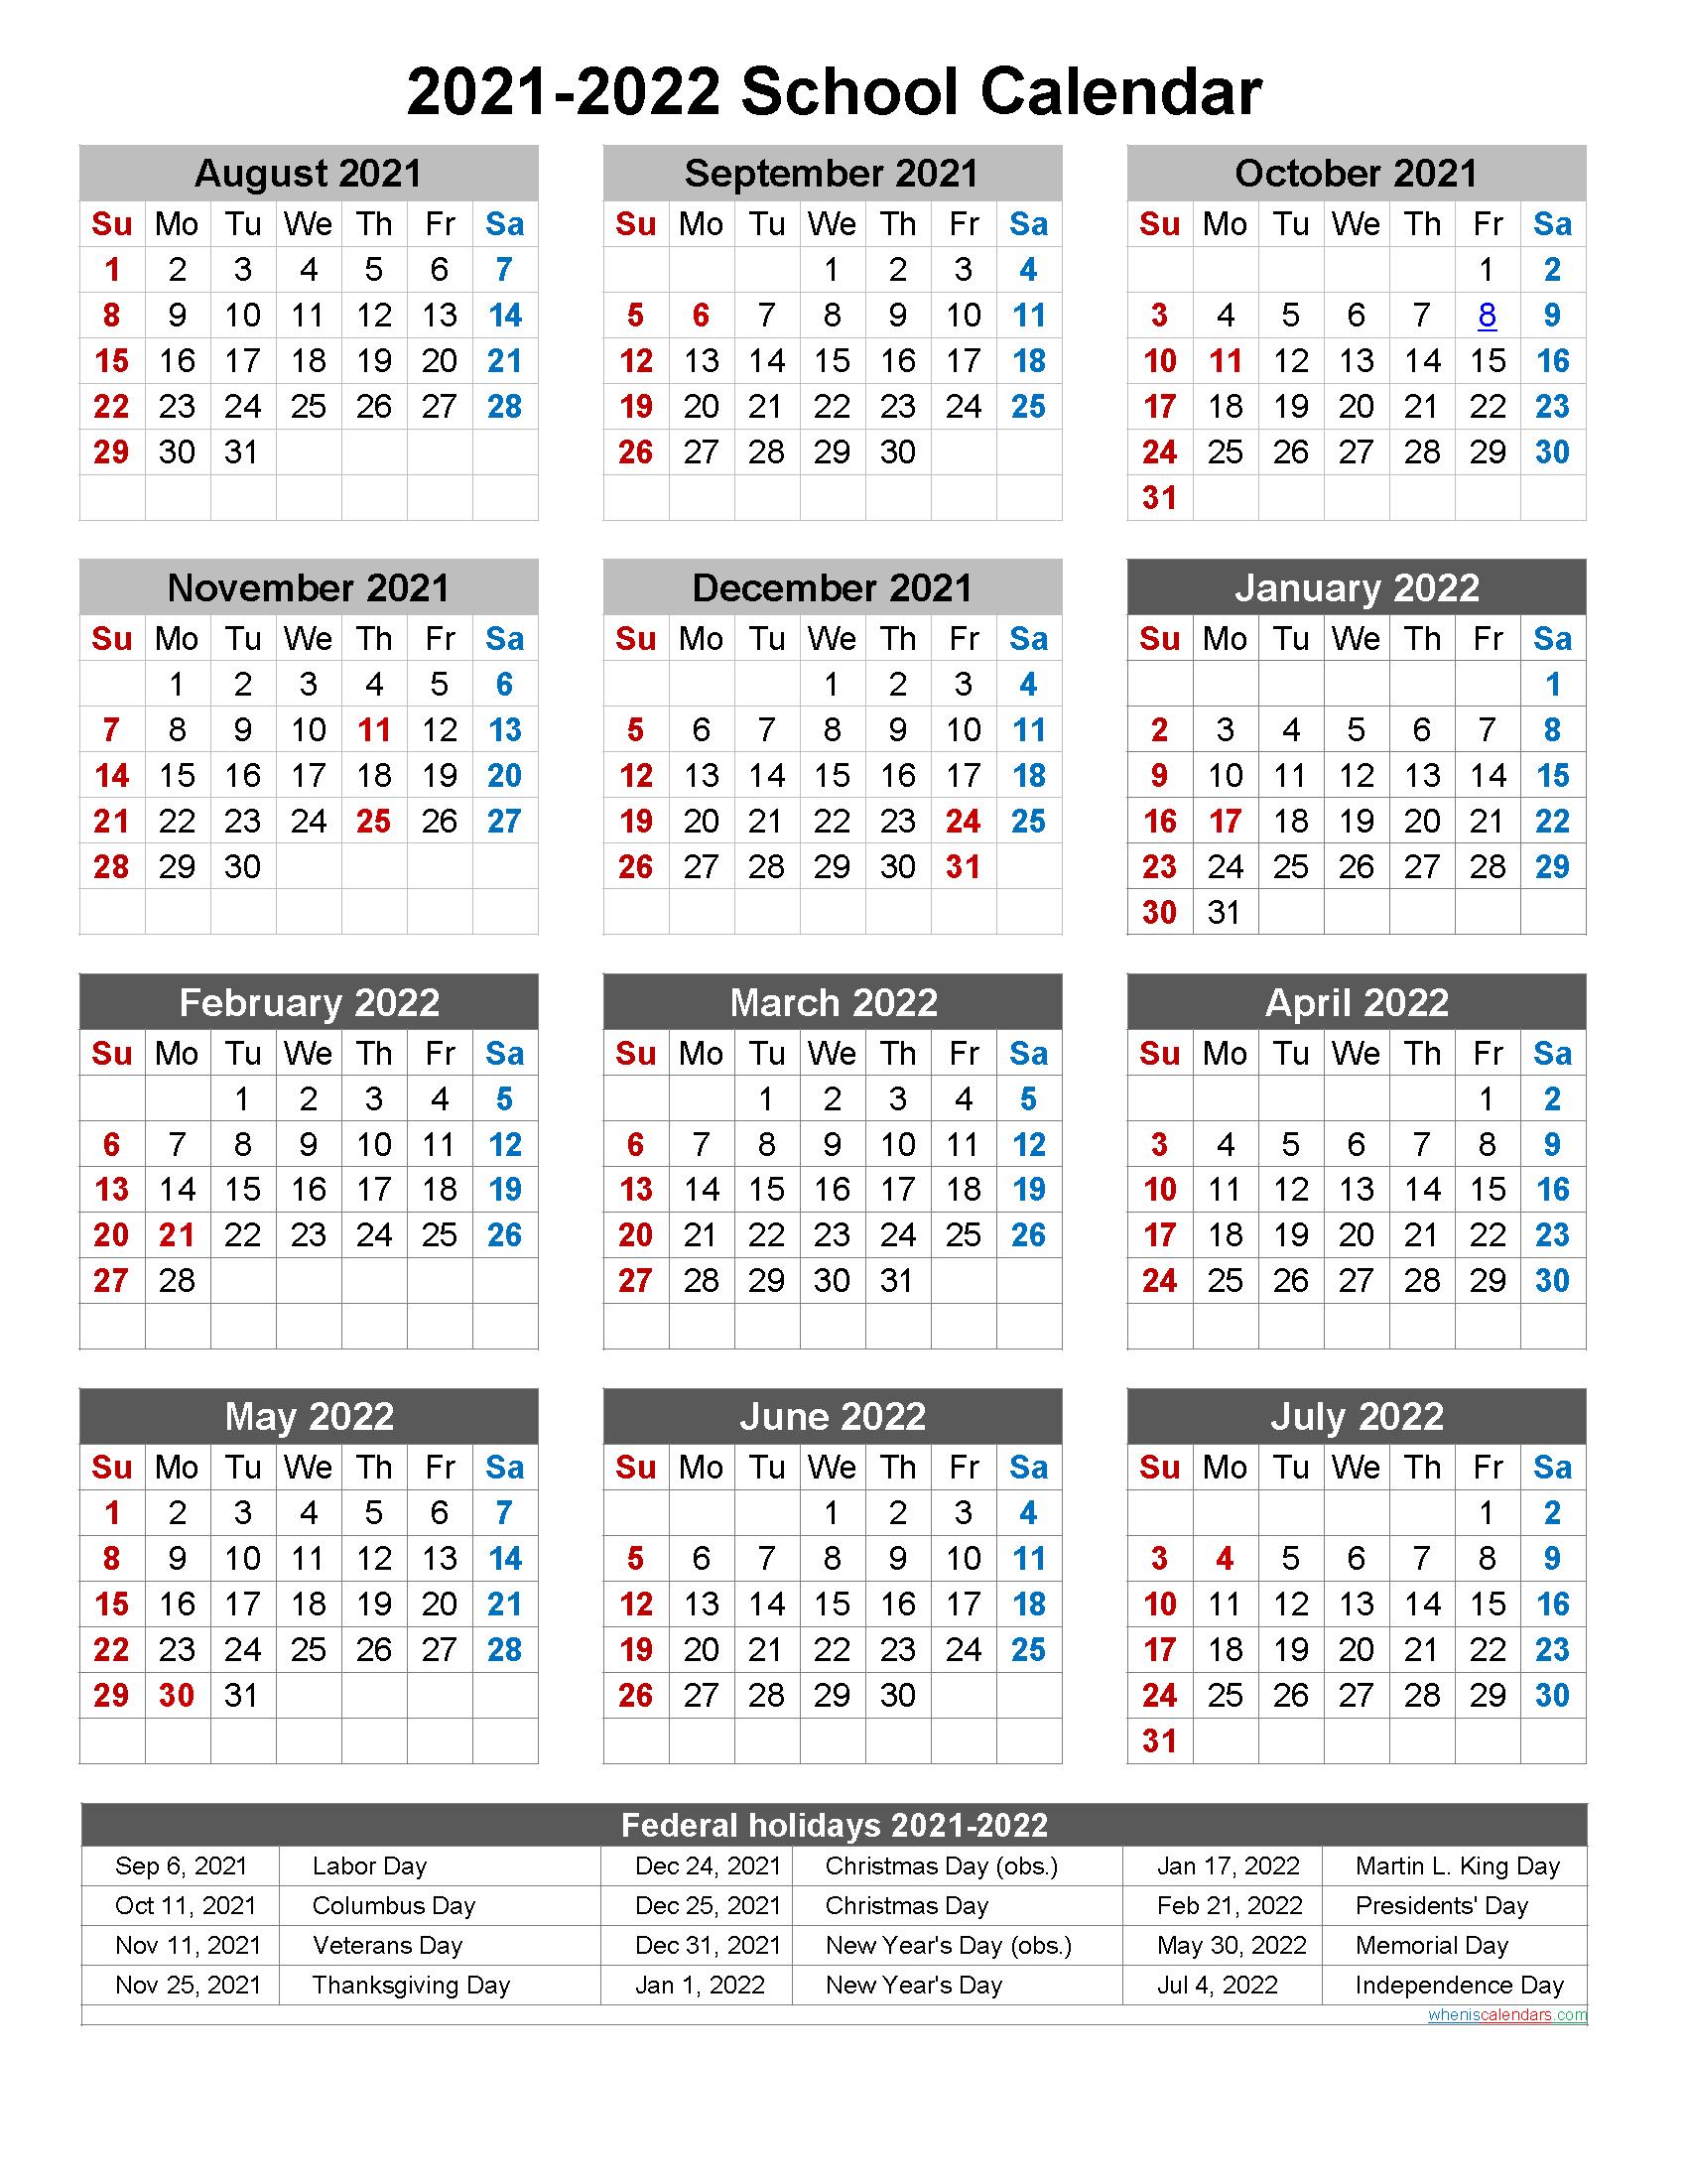 2021-2022 School Calendar Template 2021 and 2022 School Calendar Printable (Portrait)  Template No